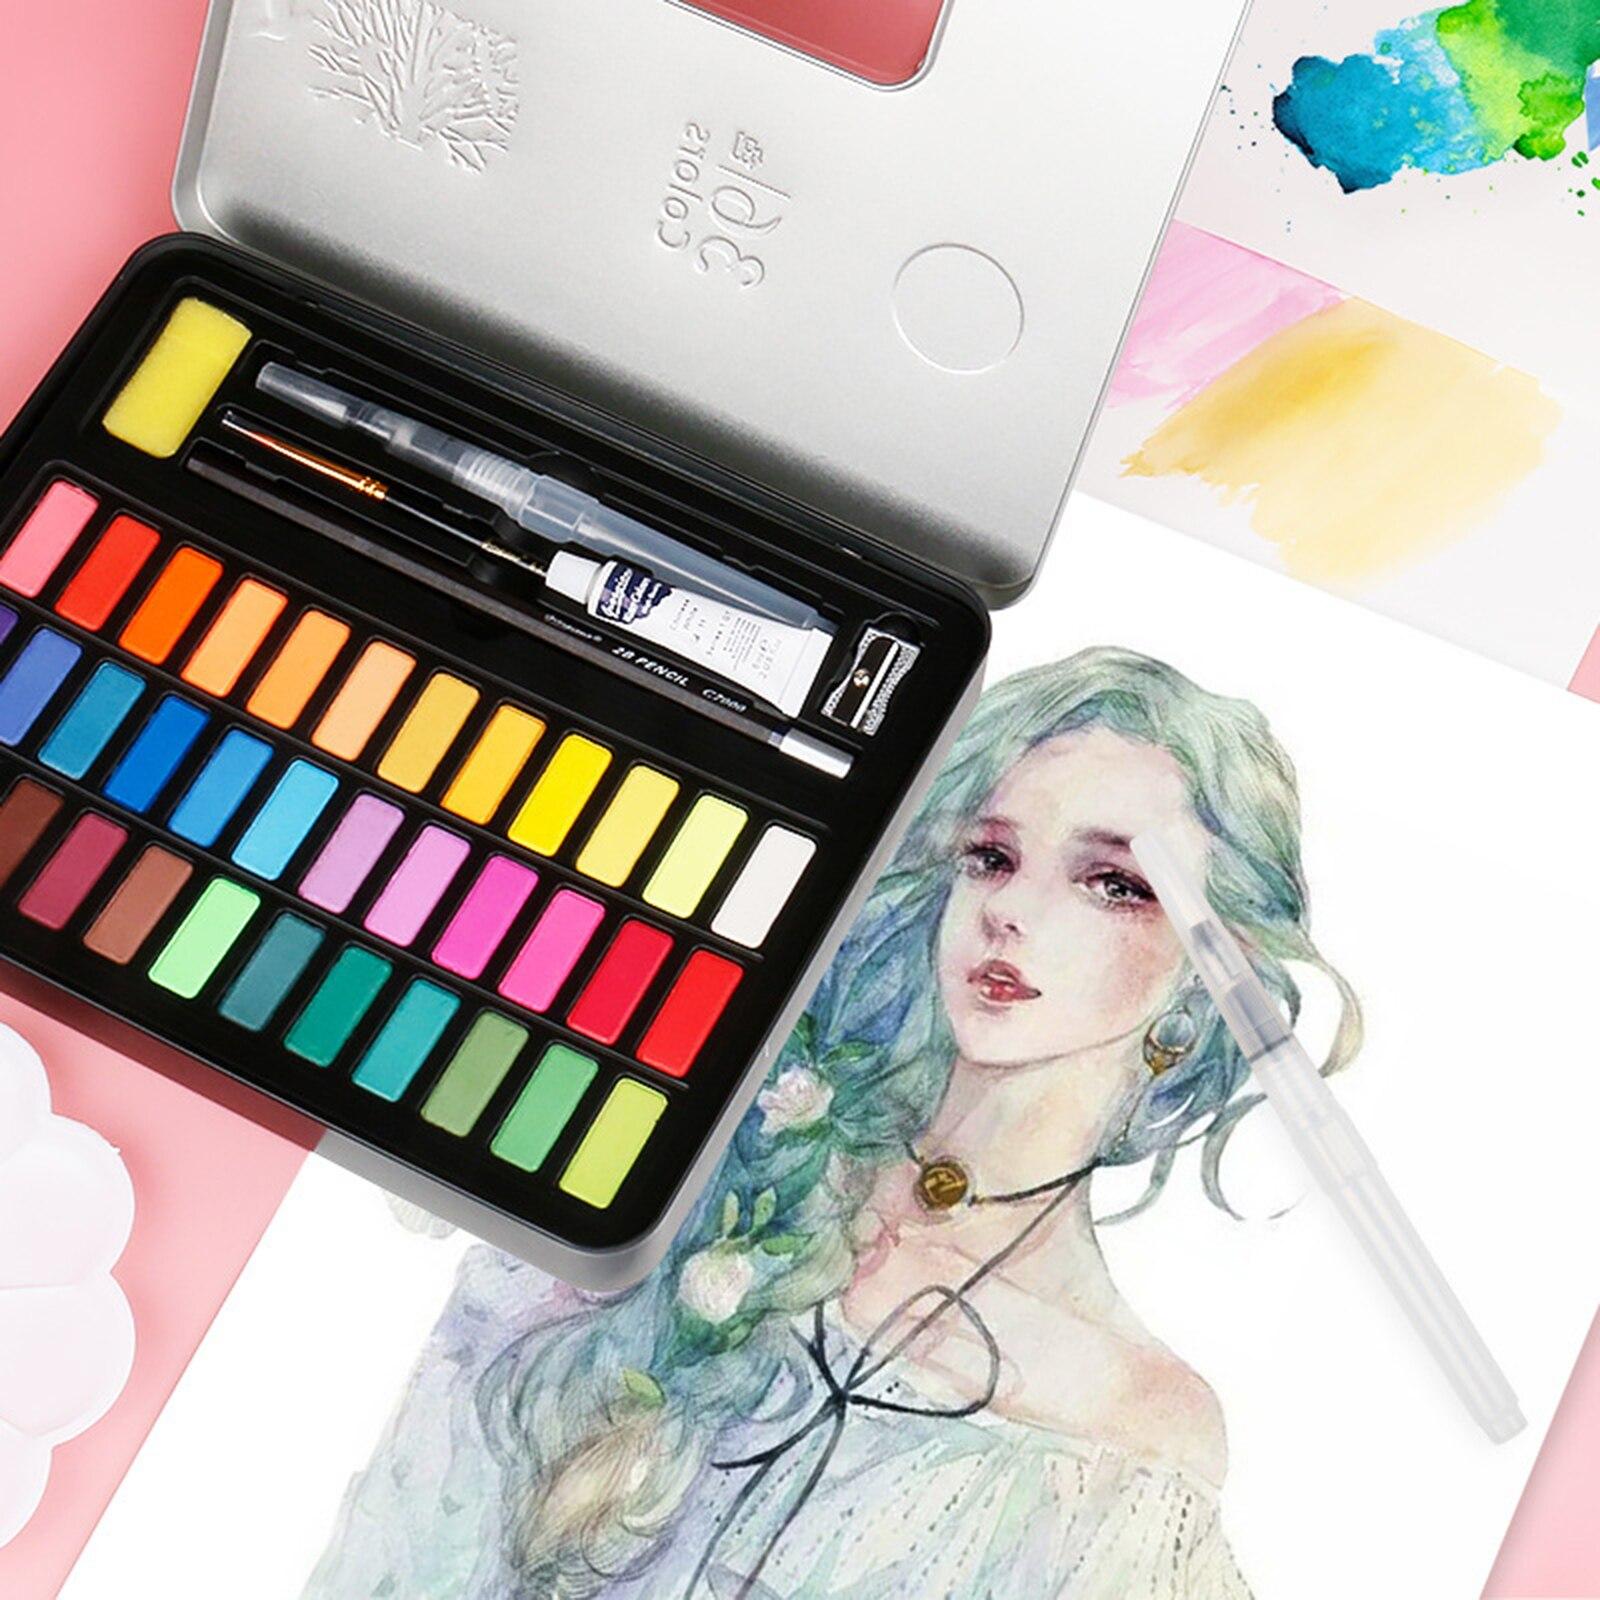 36/48 Color High Quality Solid Watercolor Paint Set 9pcs Art Supplies Fountain Pen Watercolor Paint Set For Students Beginners